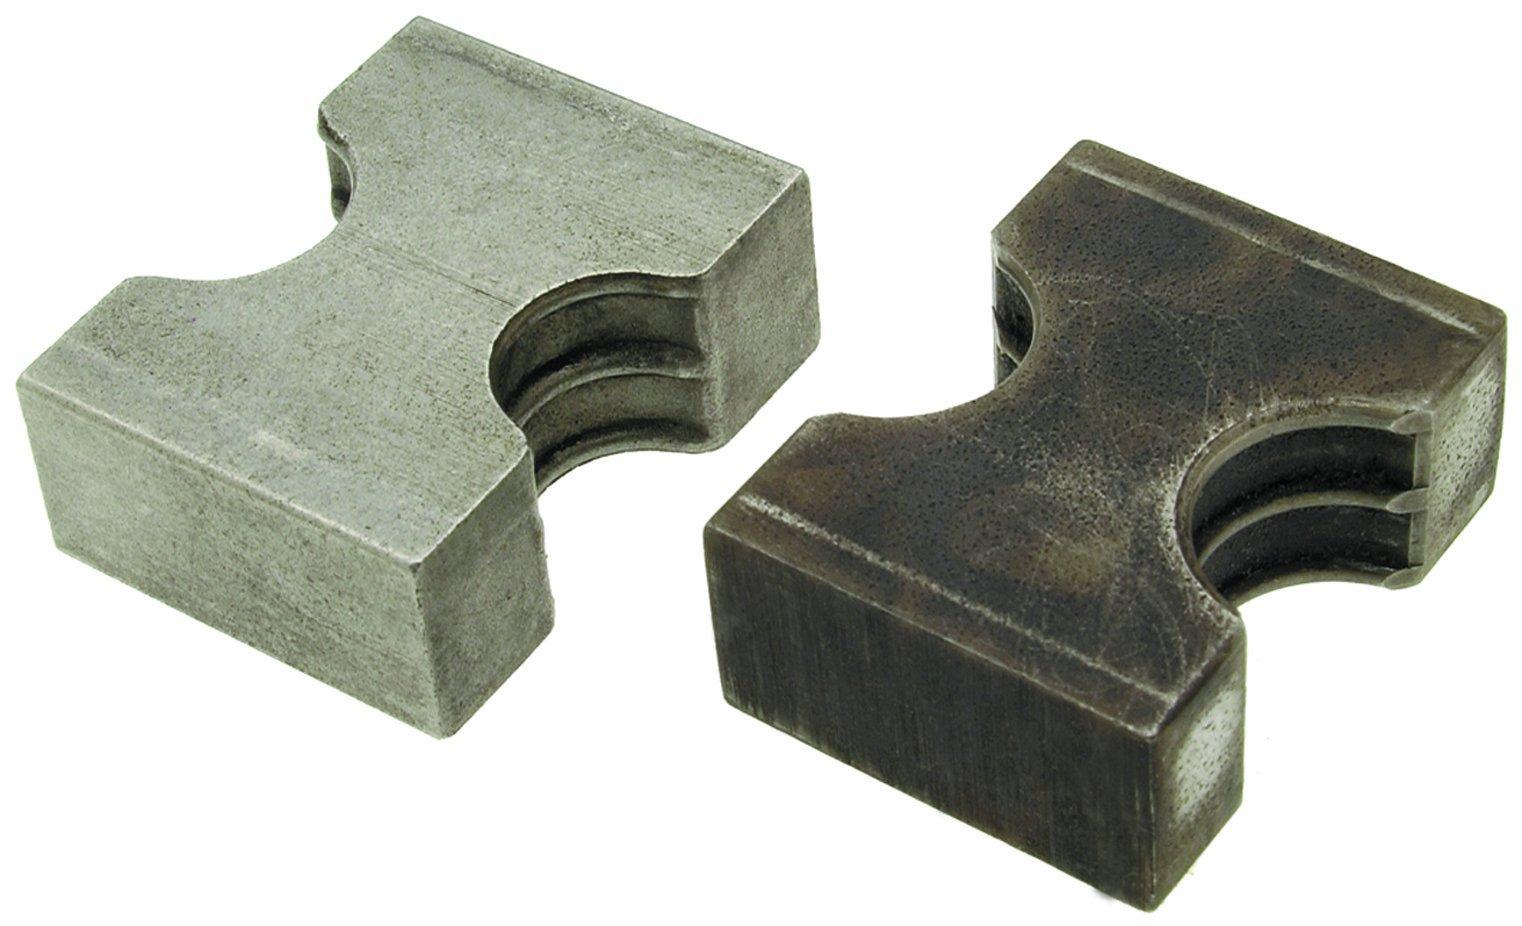 Amflo 856-1 Hardened Steel Die Block Set for Hose Crimping Tool - 5/8'', 1 Pack by Amflo (Image #1)